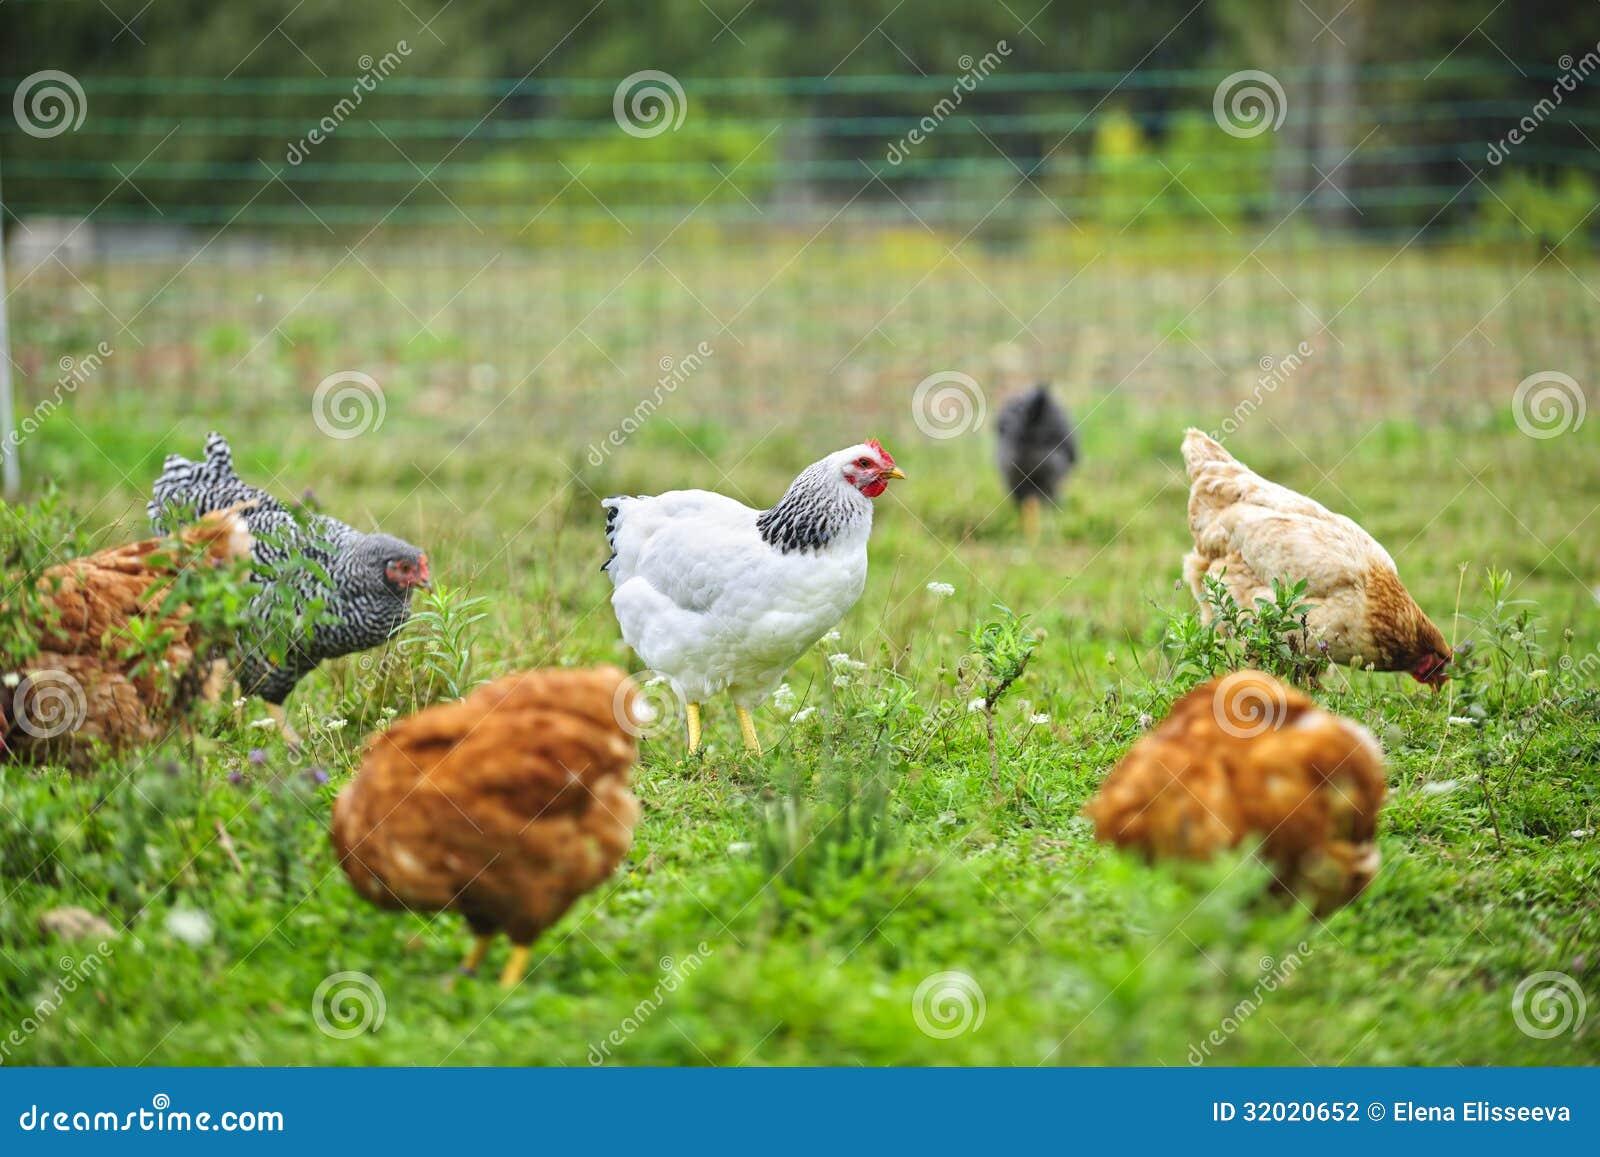 Free range chickens on farm